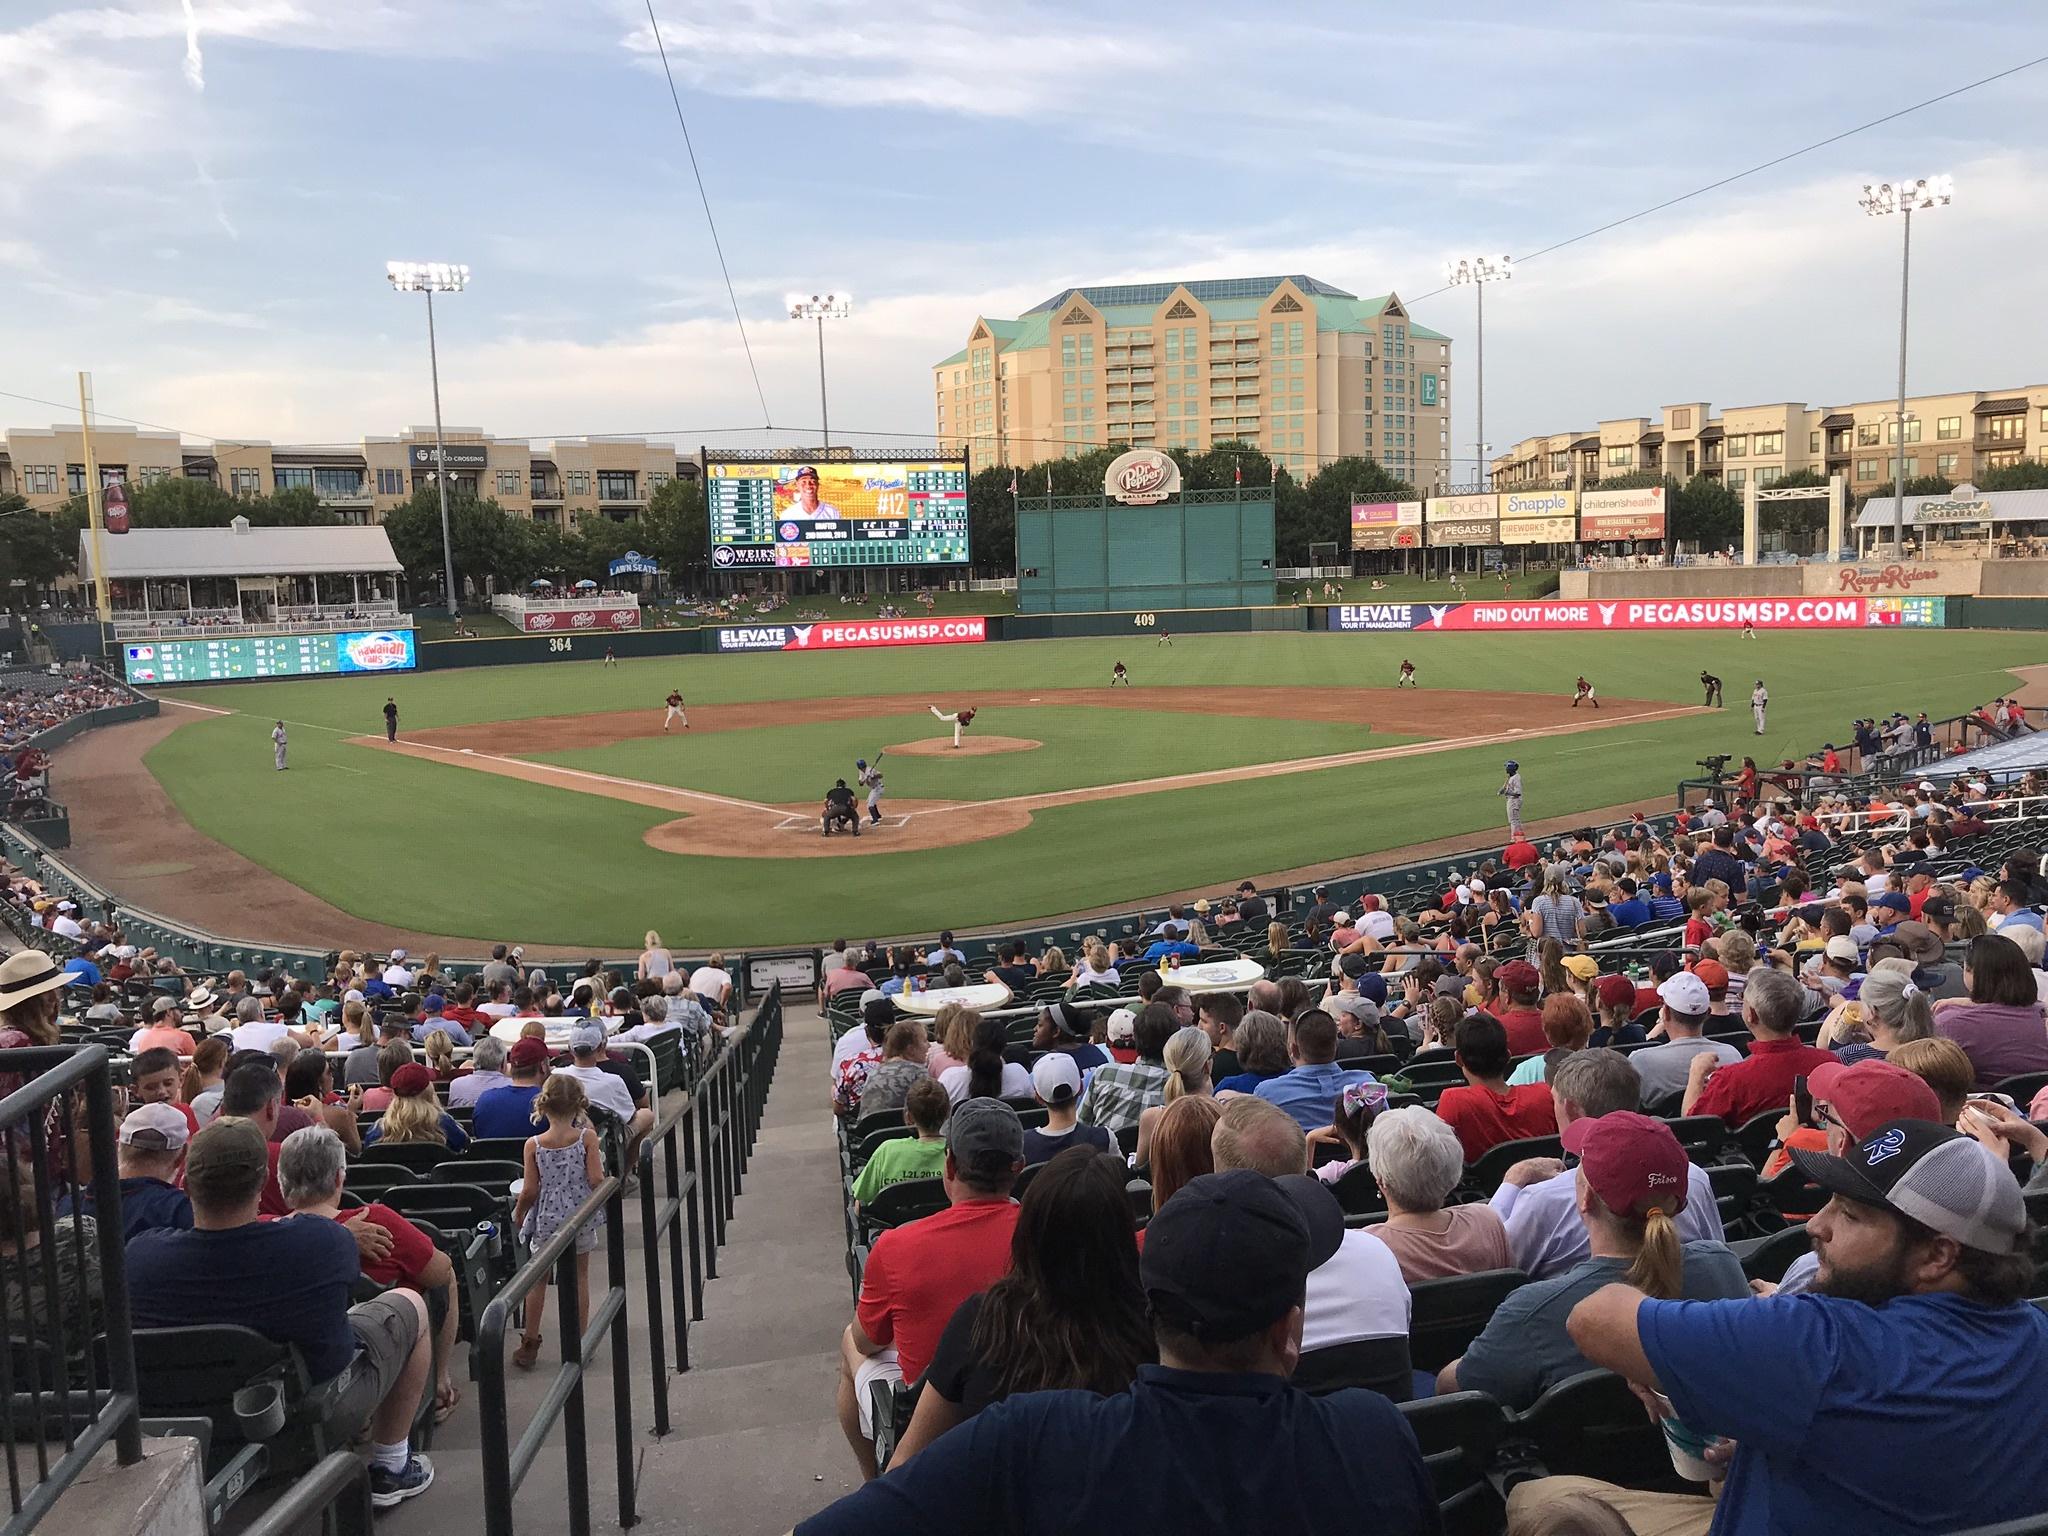 2Aテキサスリーグ、フリスコ・ラフライダーズの本拠地ドクター・ペッパー・スタジアムでの試合風景、2019年豊浦彰太郎撮影